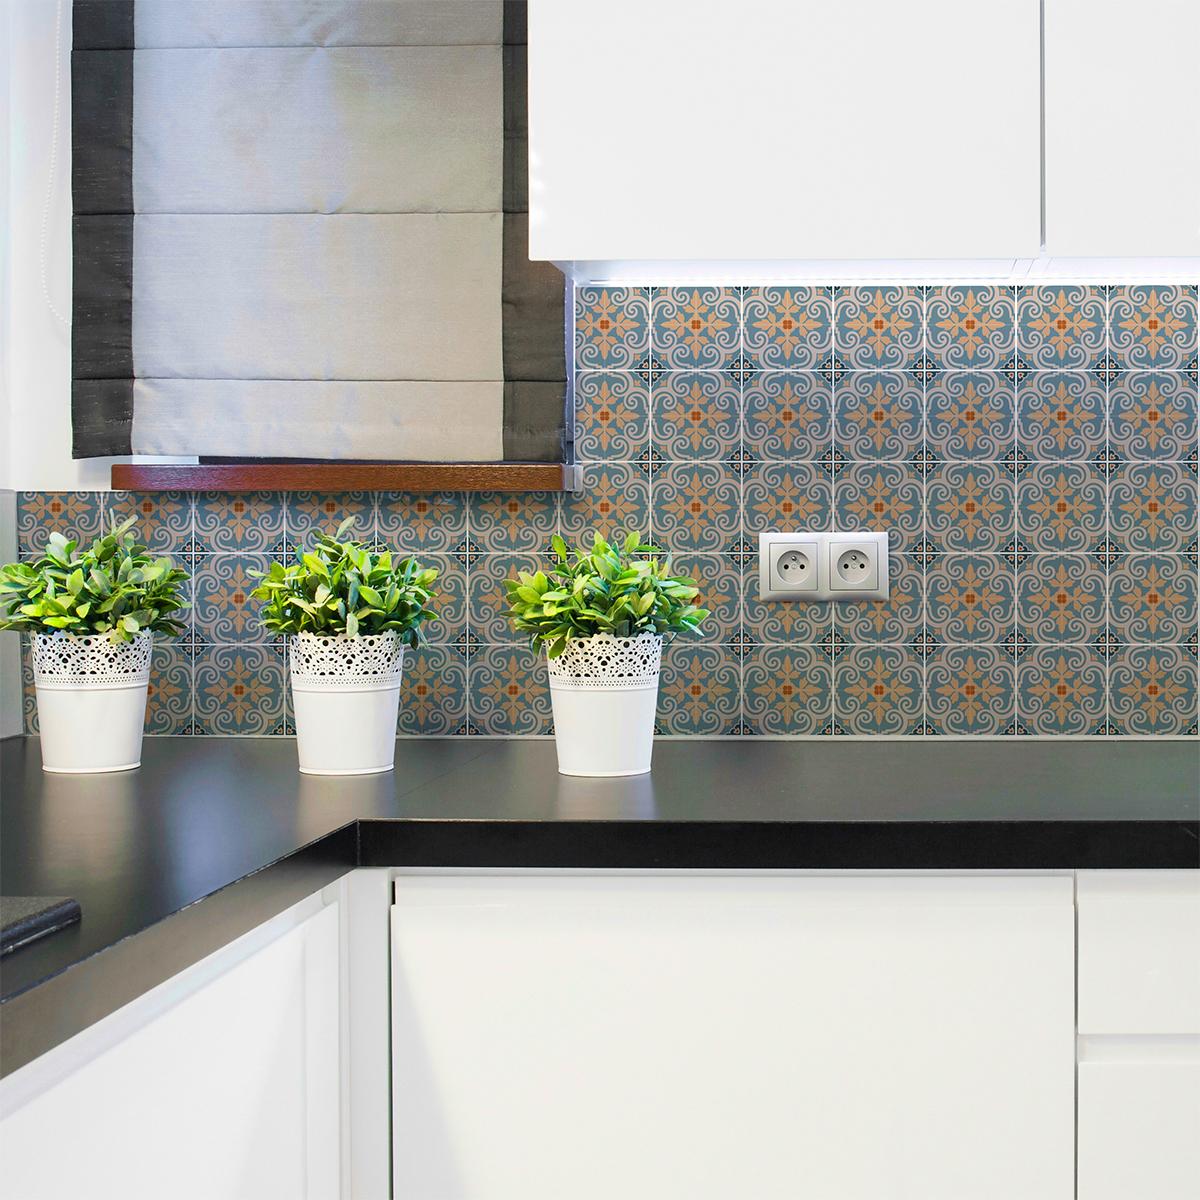 60 stickers carreaux de ciment azulejos dorena cuisine. Black Bedroom Furniture Sets. Home Design Ideas